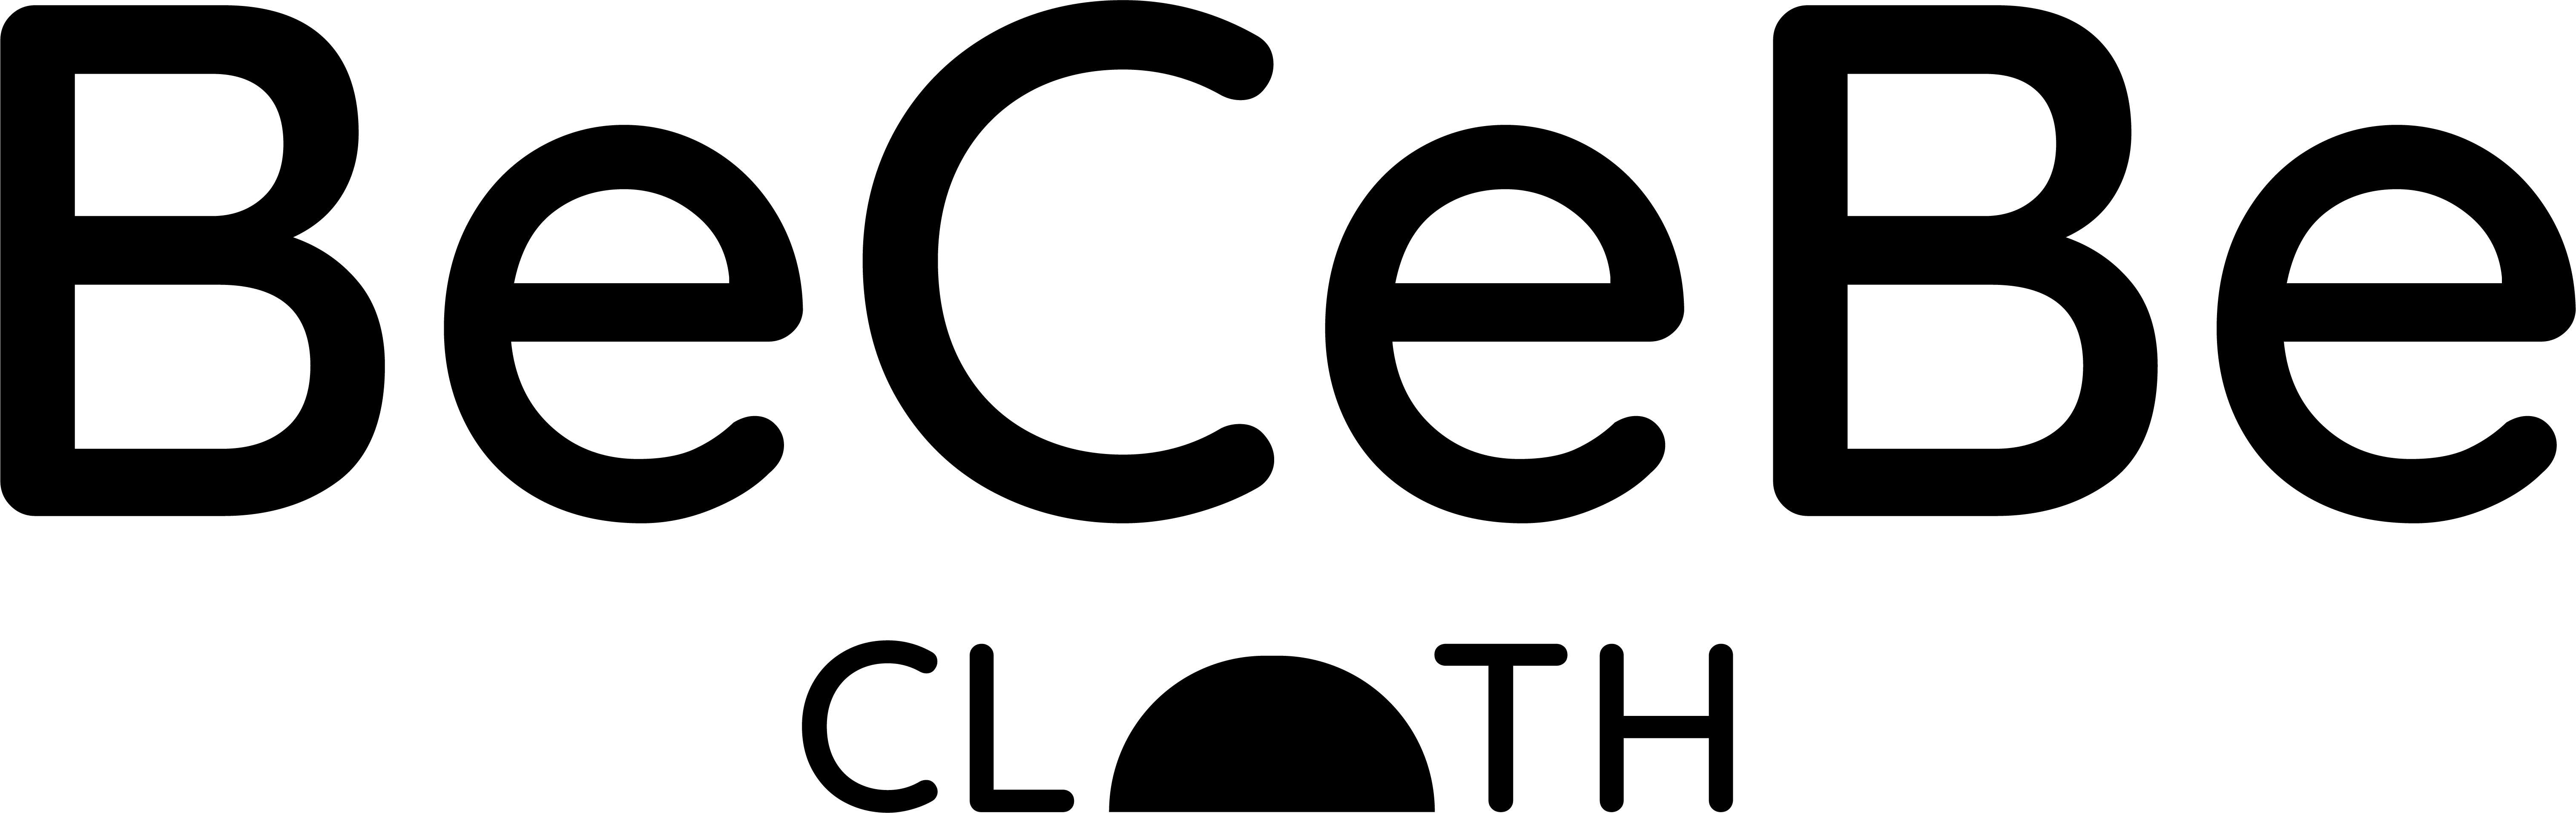 Becebe logo